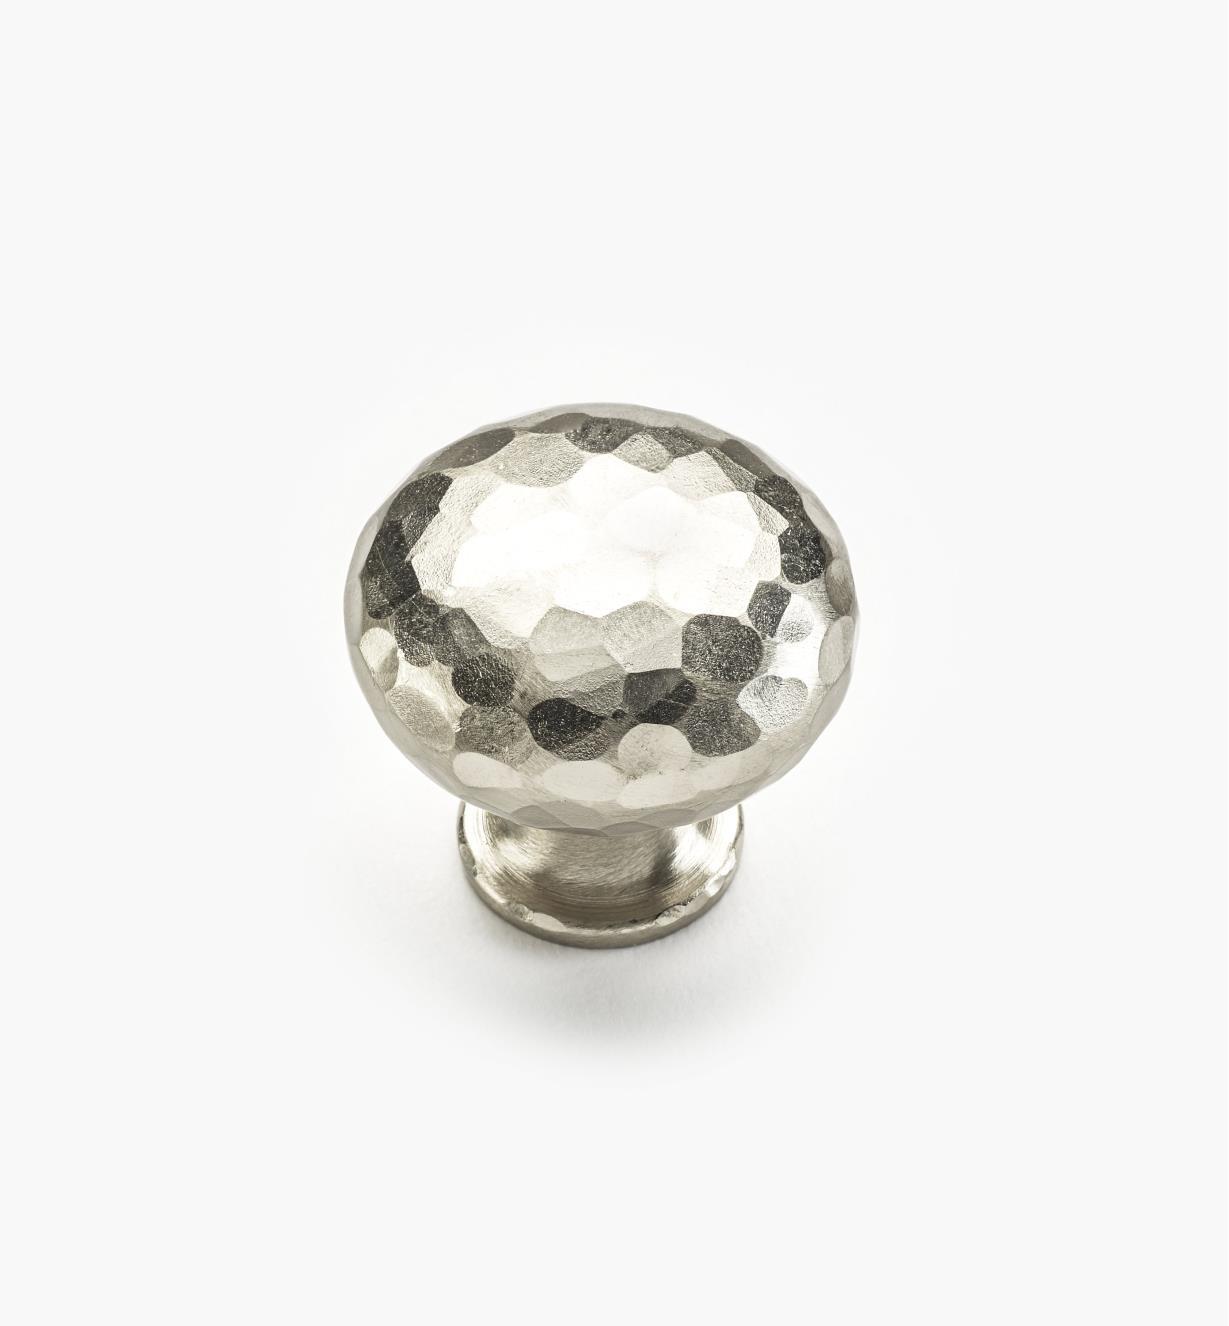 01W4365 - Bouton martelé, fini nickel satiné, 1 1/4 po x 1 1/8 po